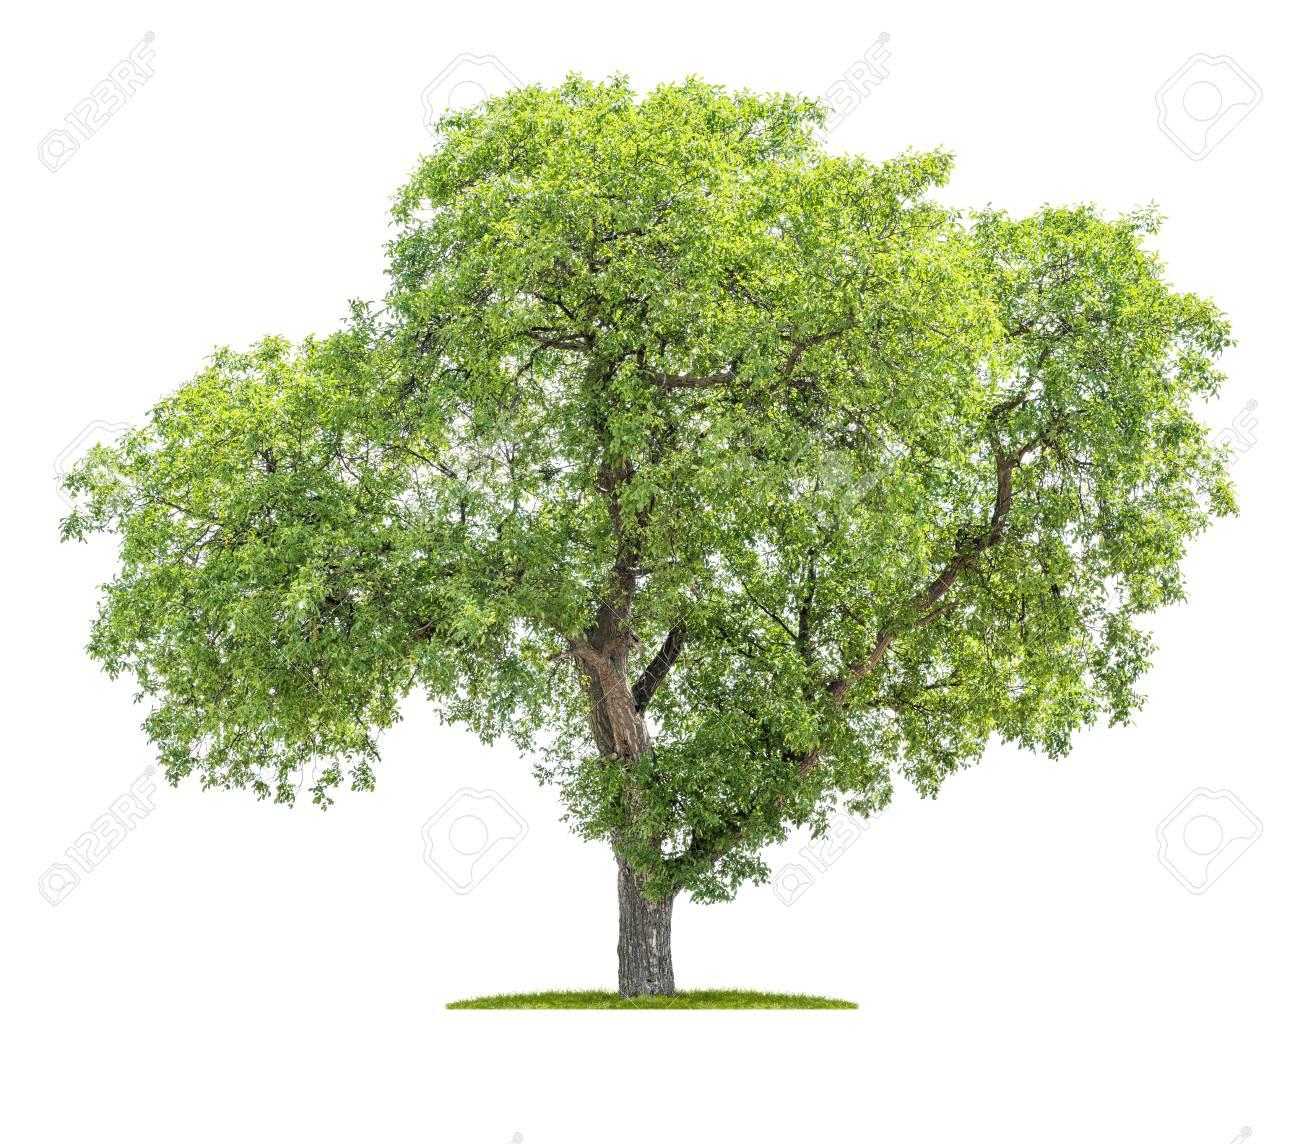 Isolated tree on a white background - Juglans regia - Walnut tree - 125517162